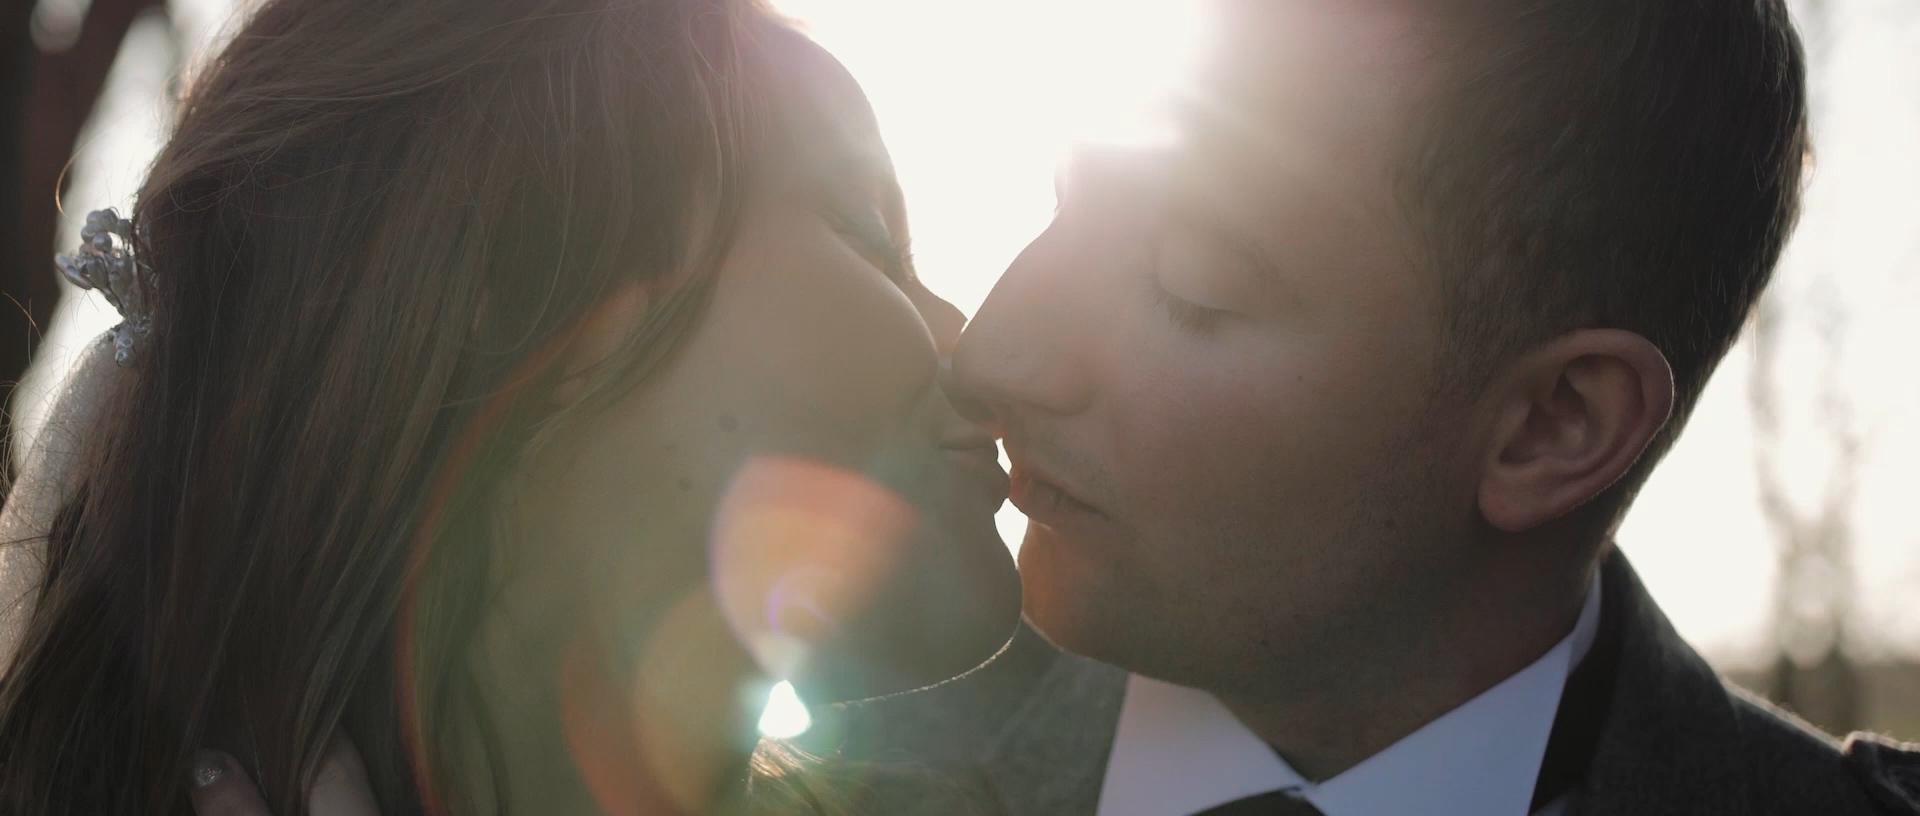 perth-wedding-videographer_LL_03.jpg